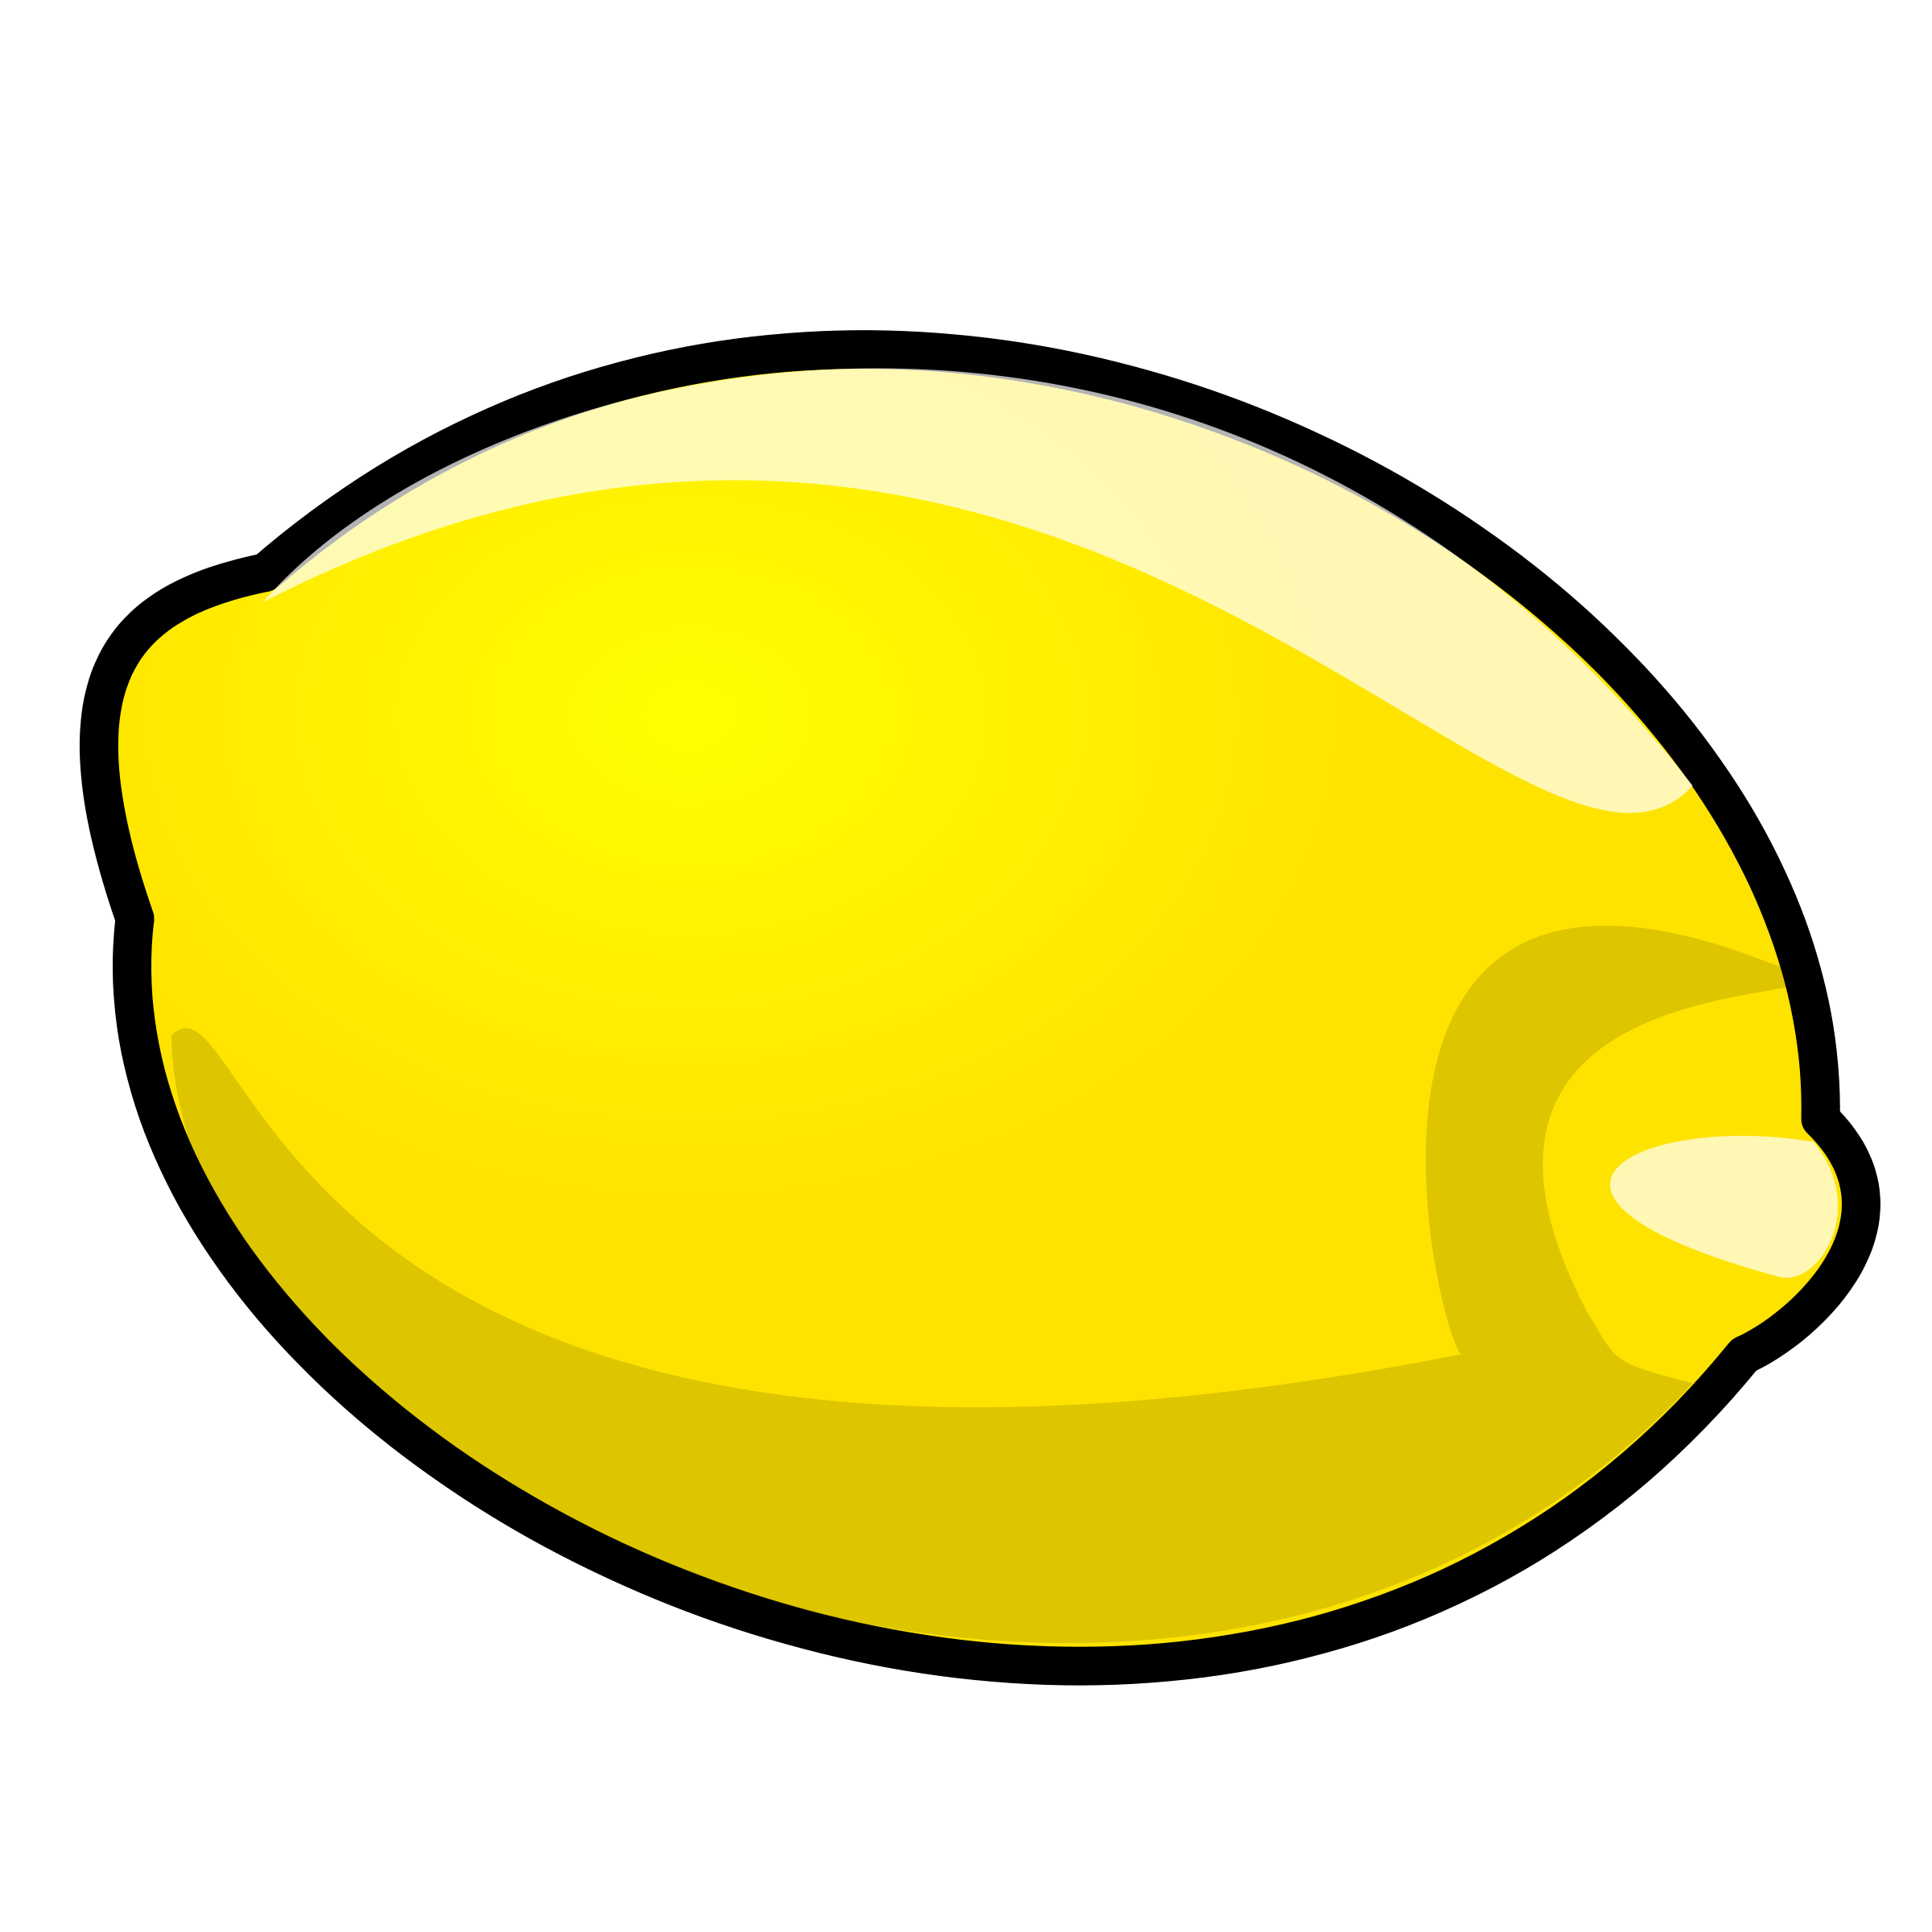 image library download Lemon clipart watercolor. Panda free images.